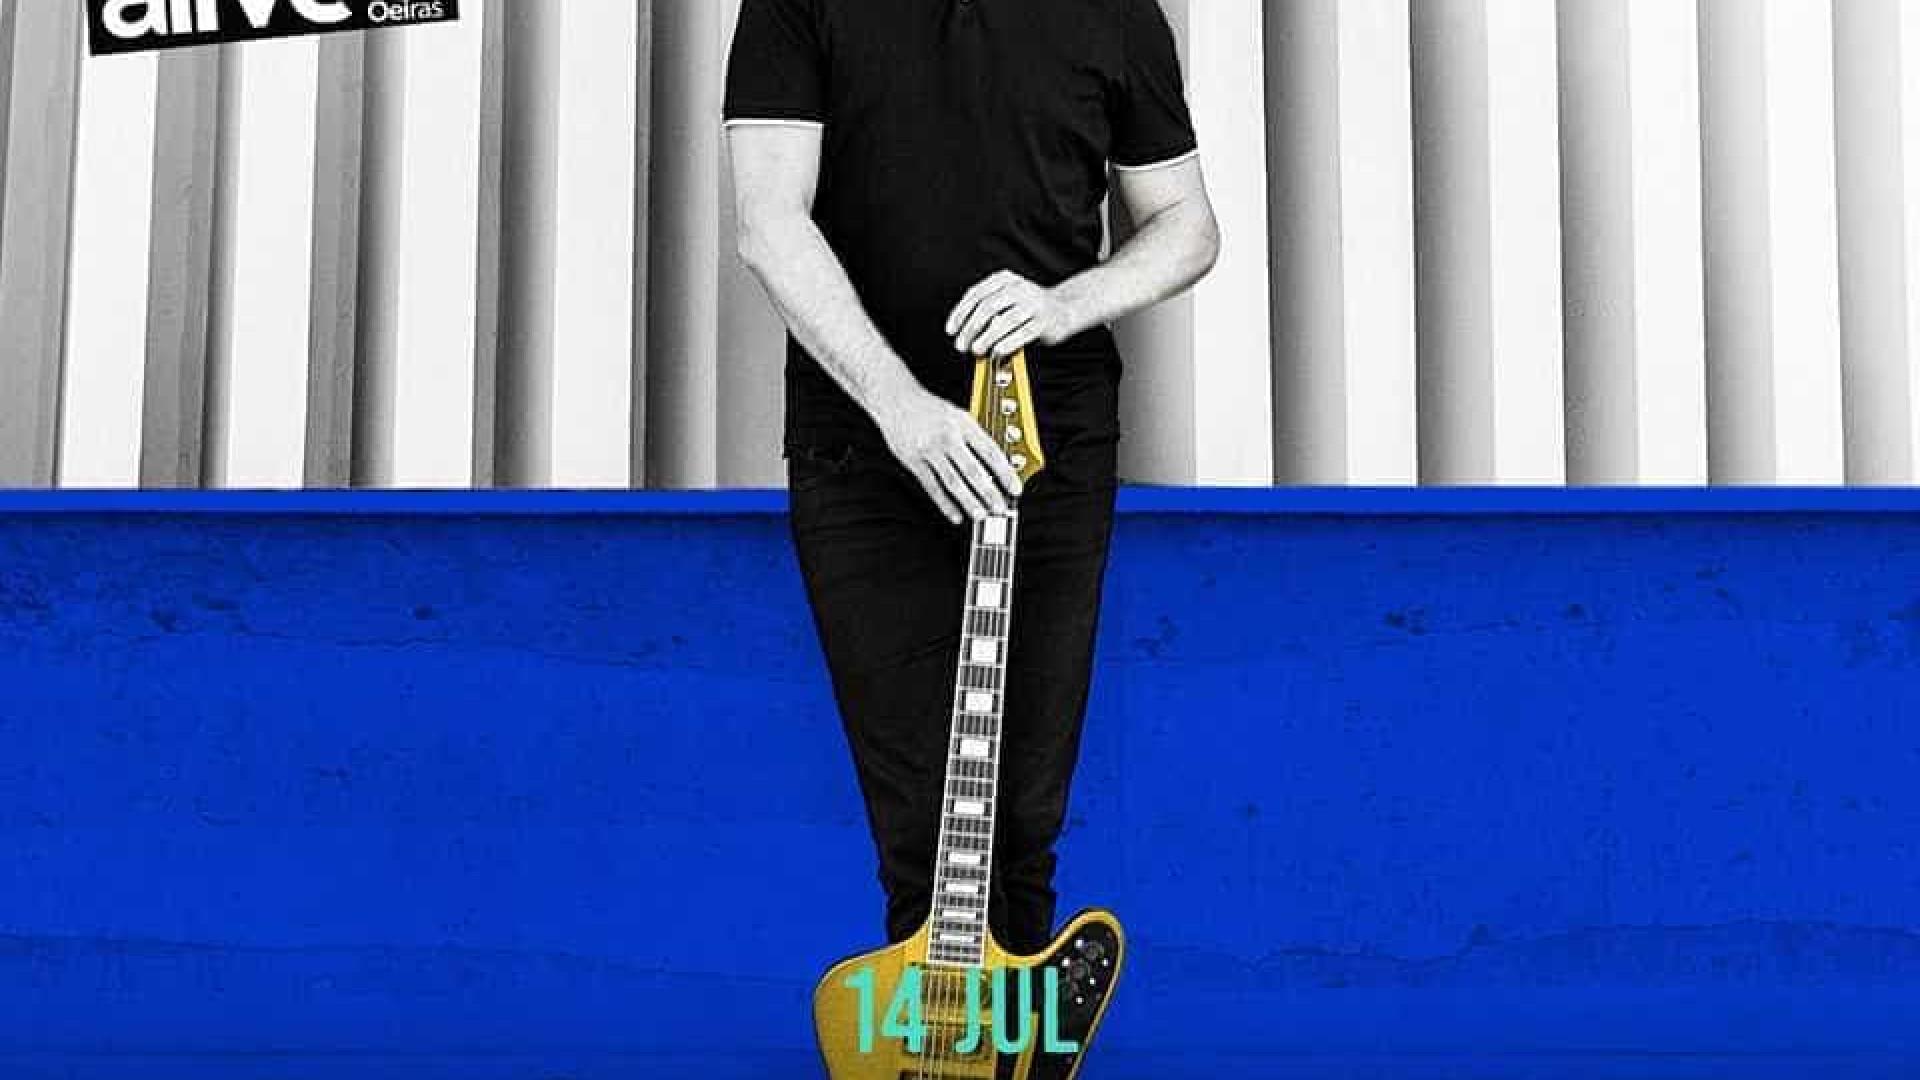 Festival Alive anuncia Jack White